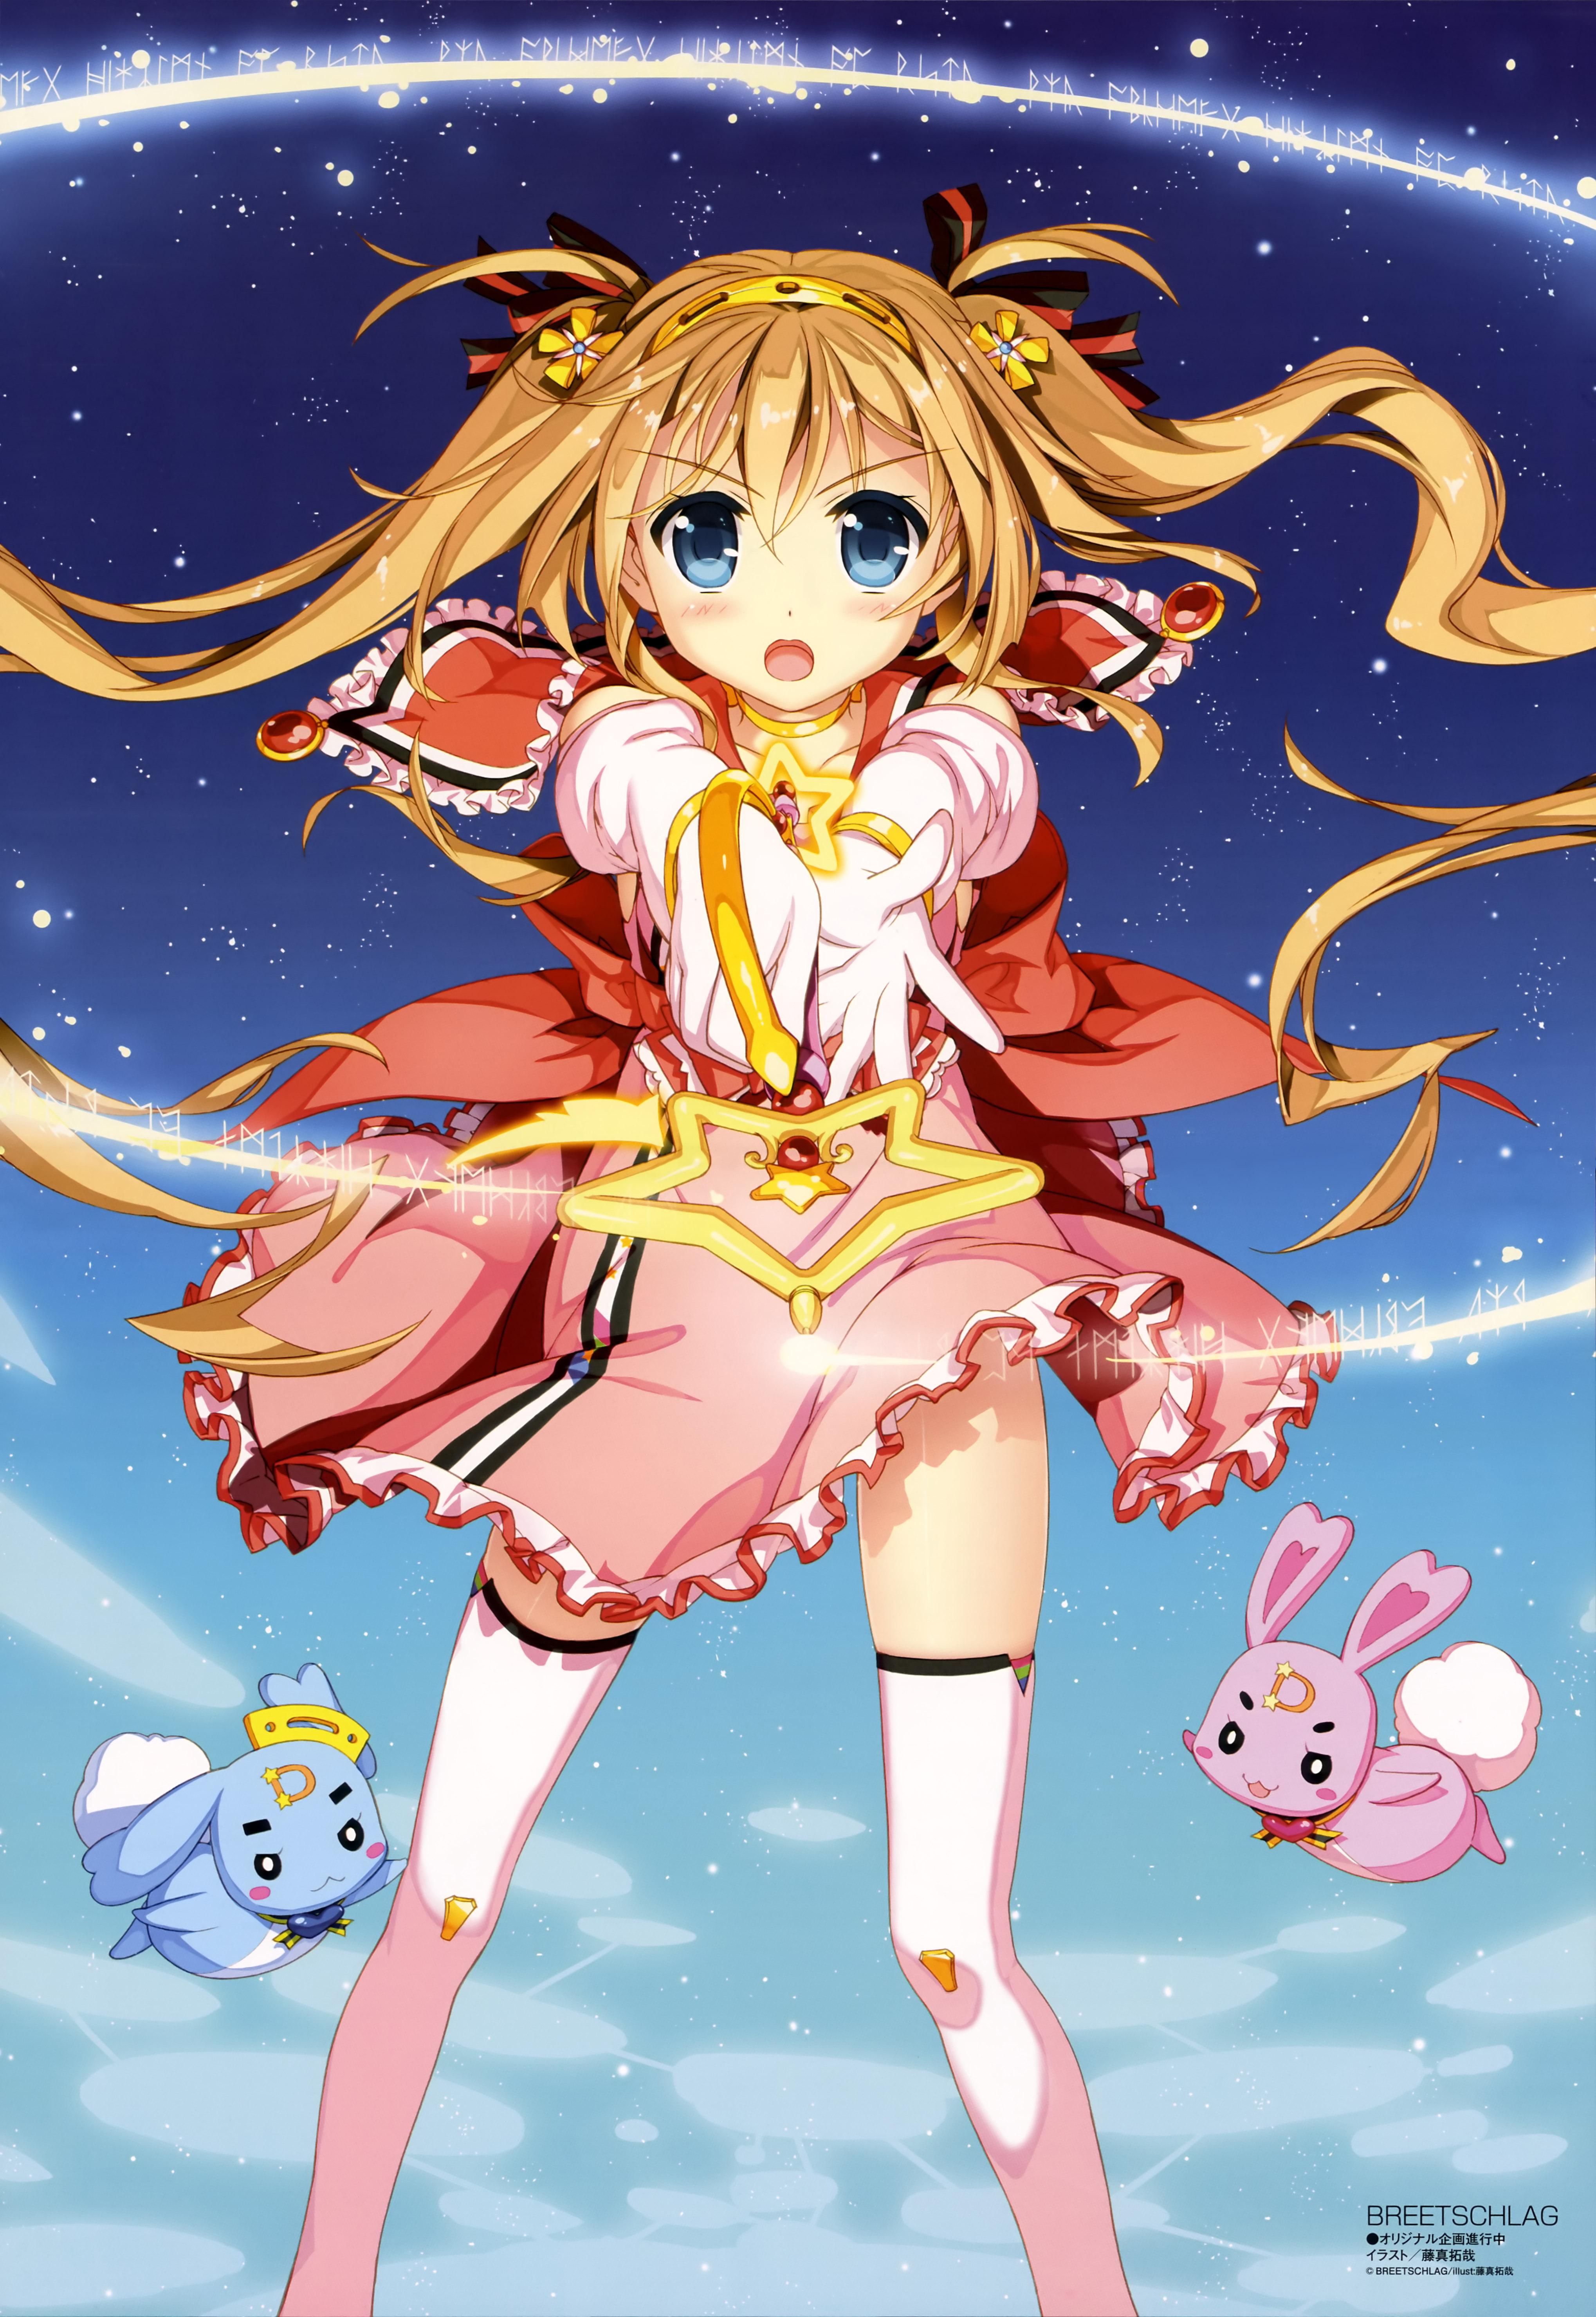 Haruhichan.com Megami MAGAZINE November 2014 posters breetschlag dress fujima_takuya thighhighs